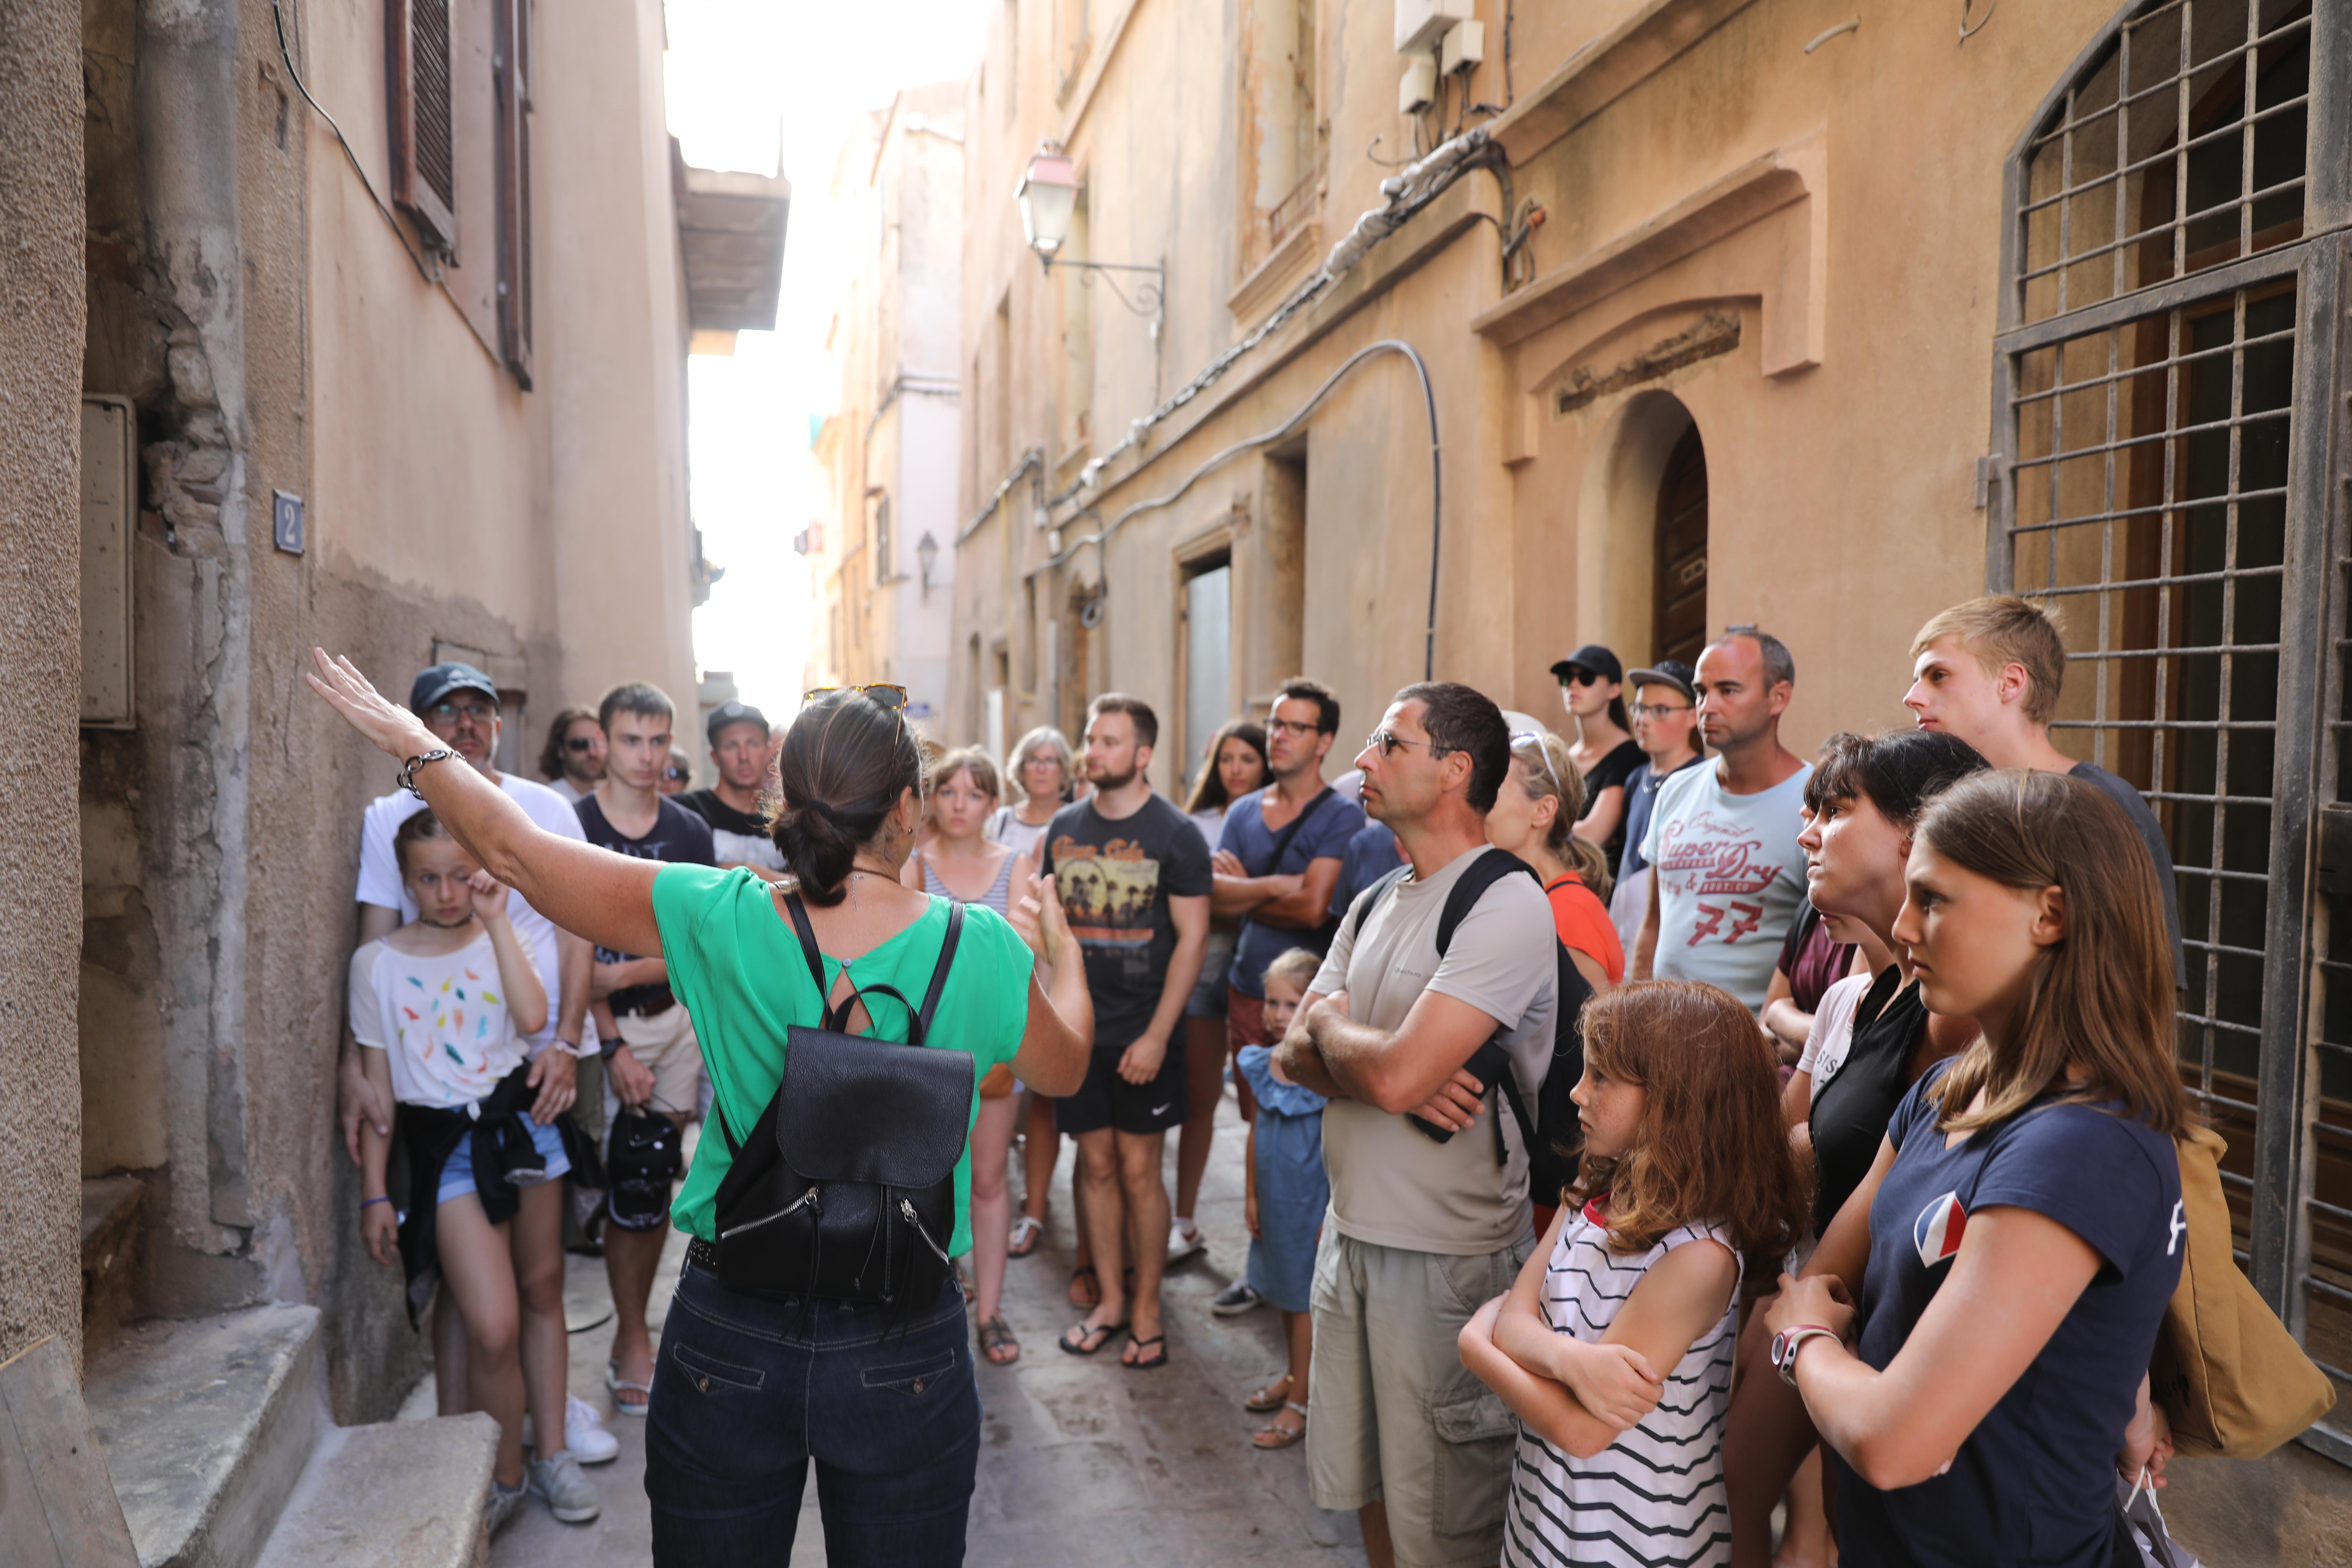 visita-guidata-scoperta-1-bonifacio-corsica